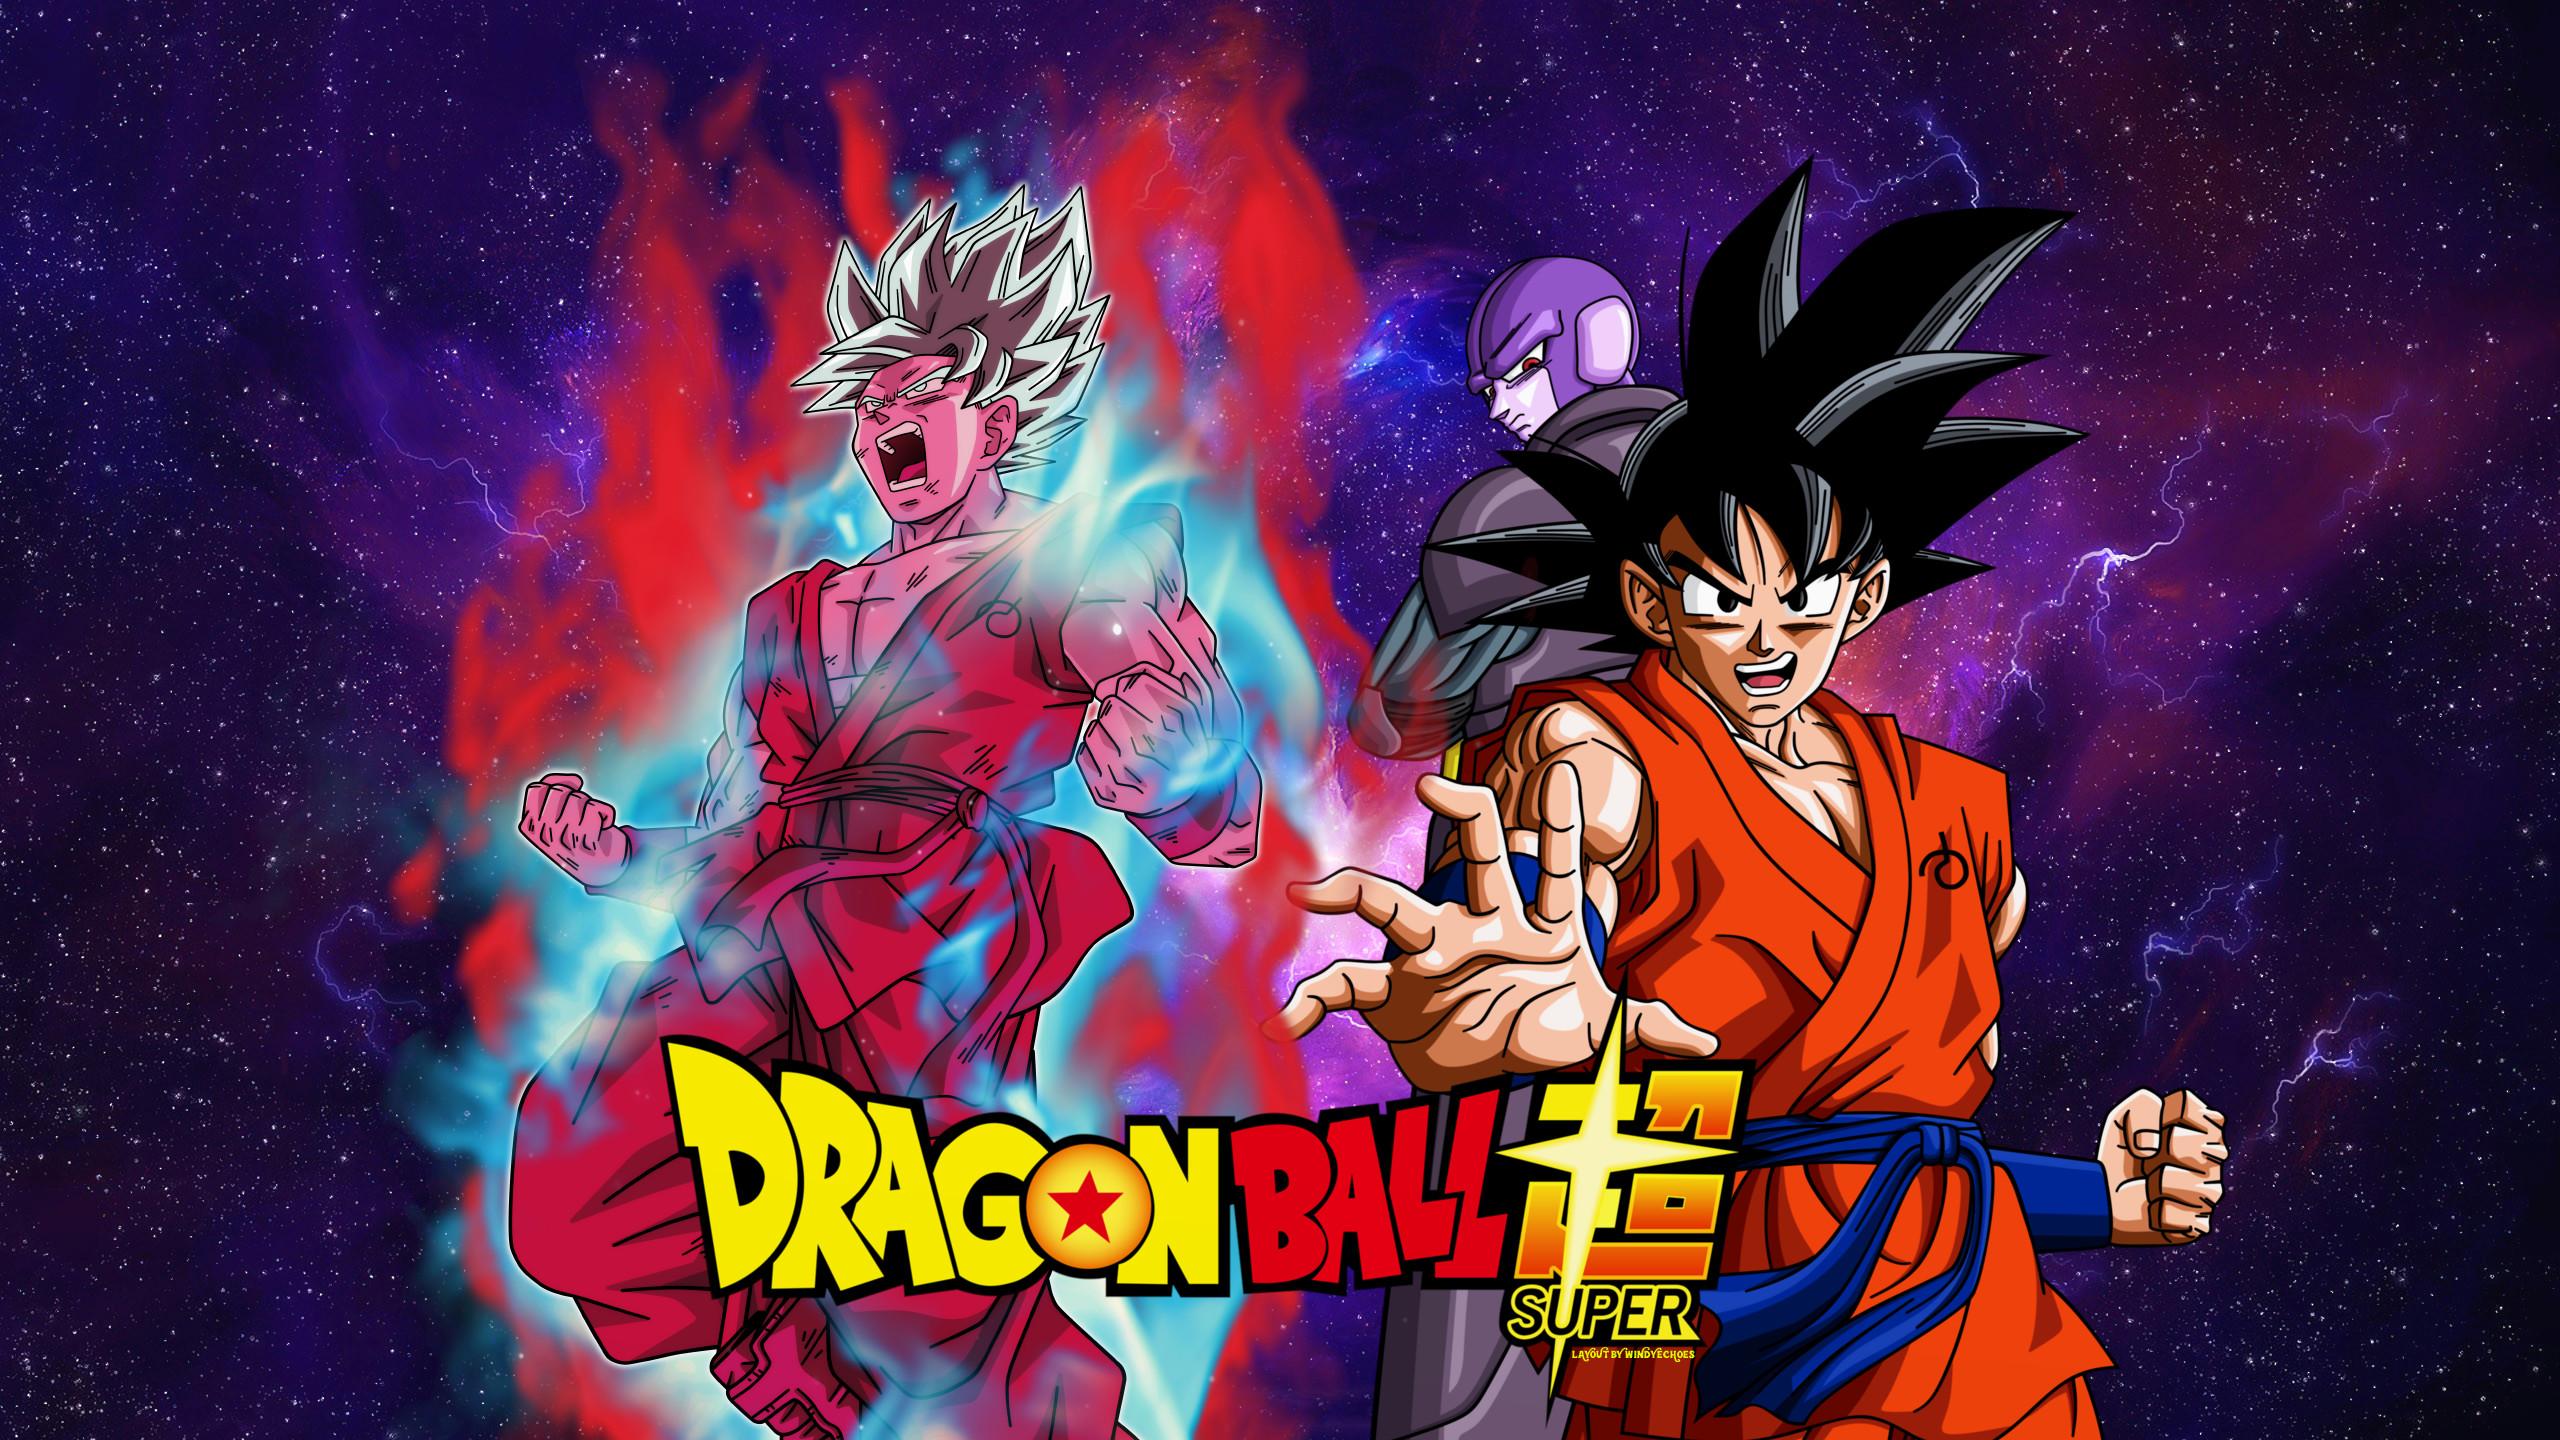 … Dragon Ball Super Wallpaper – Hit's Return by WindyEchoes